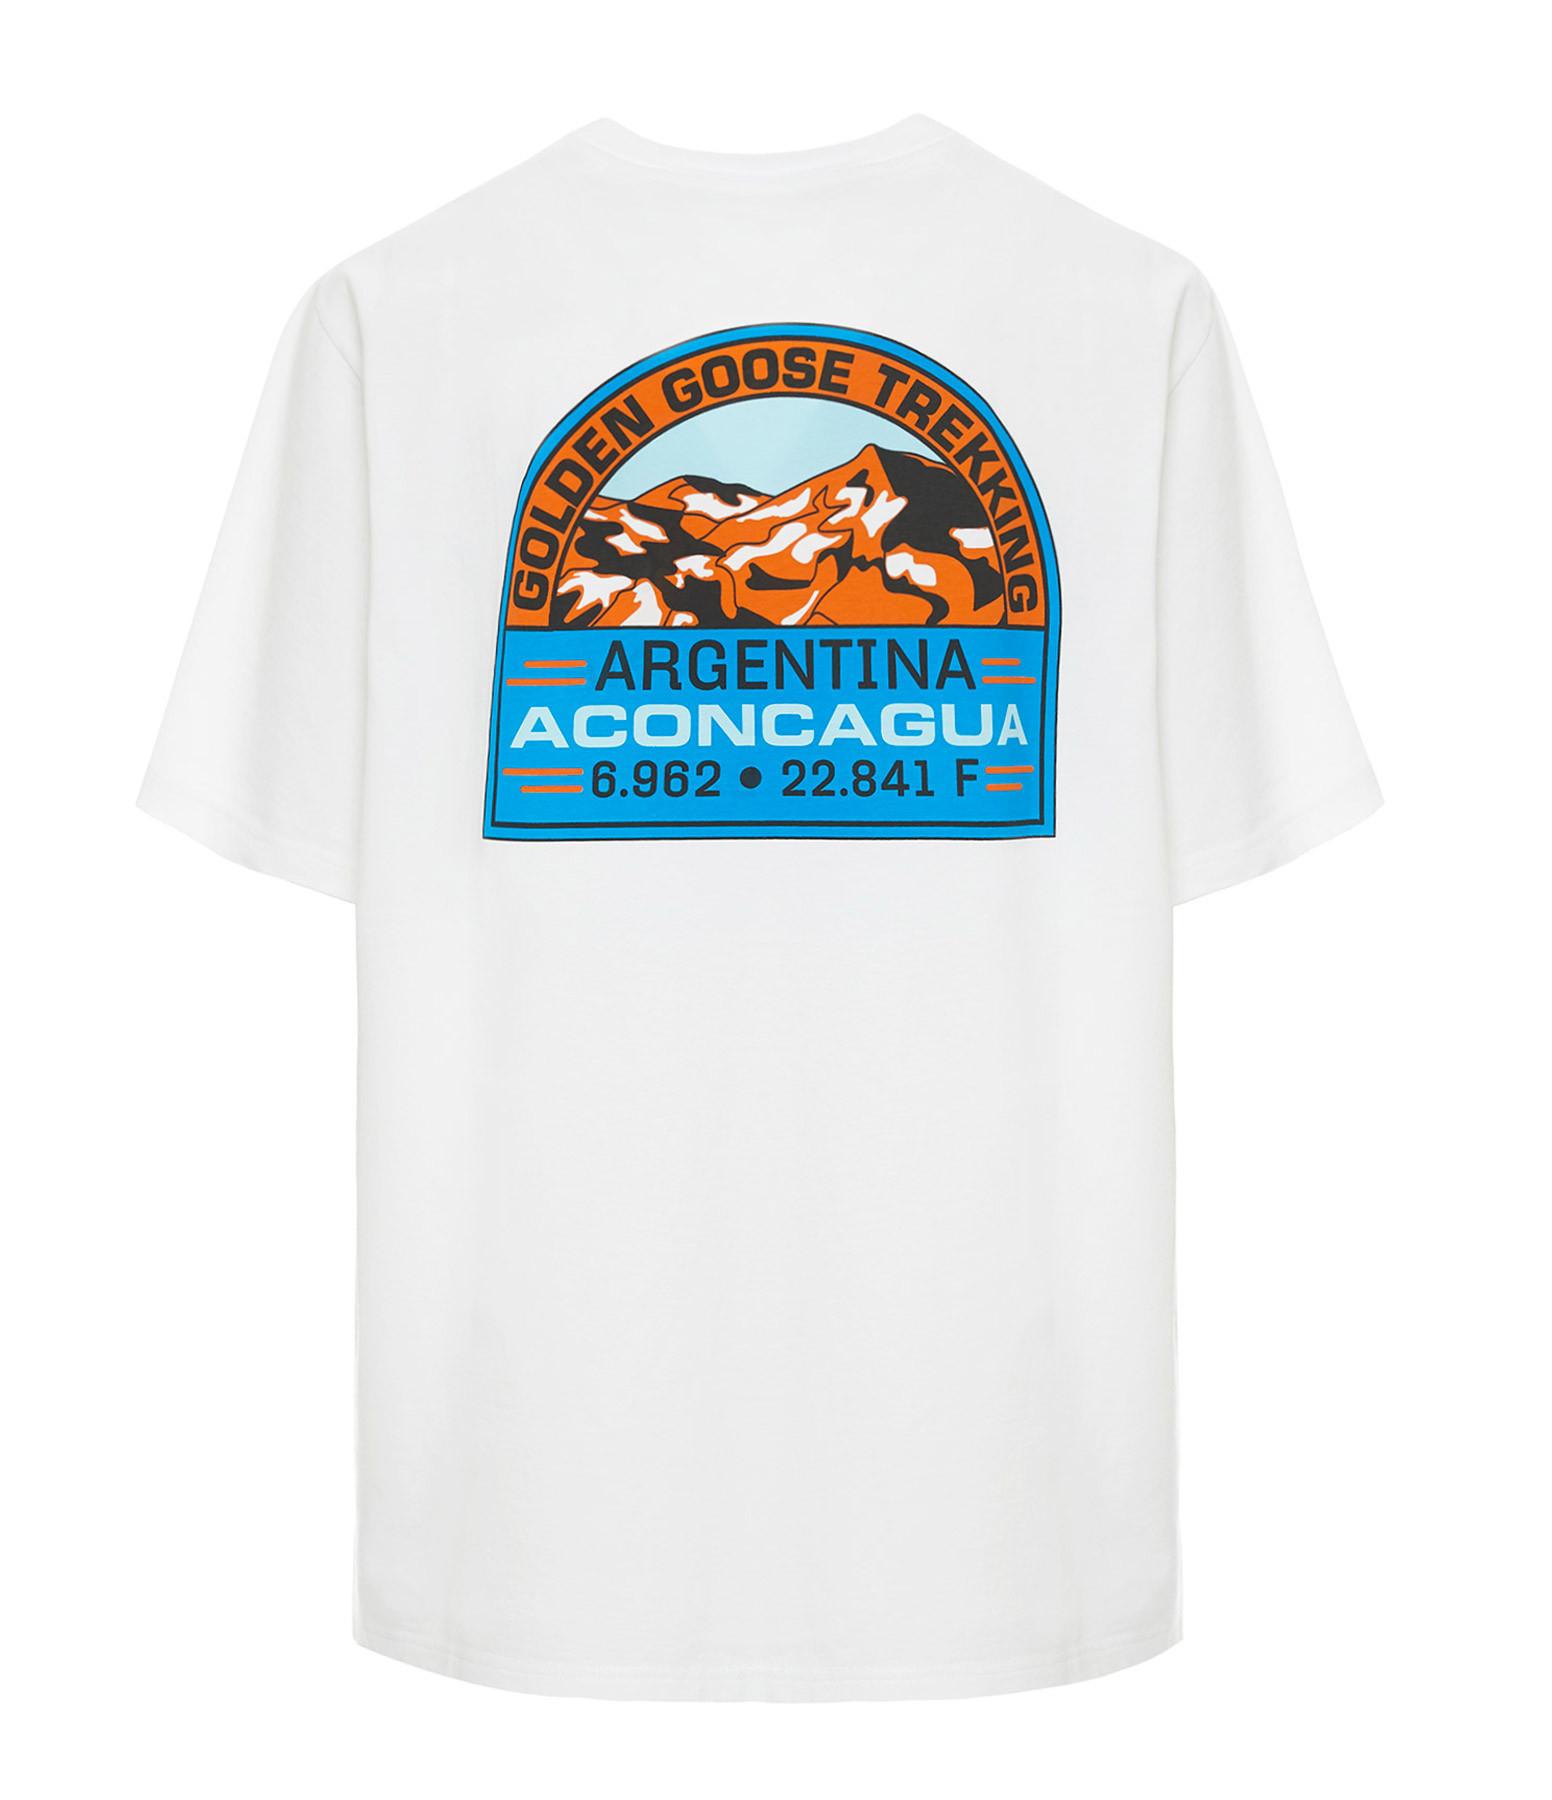 GOLDEN GOOSE - Tee-shirt Homme Adamo Argentina Blanc Noir